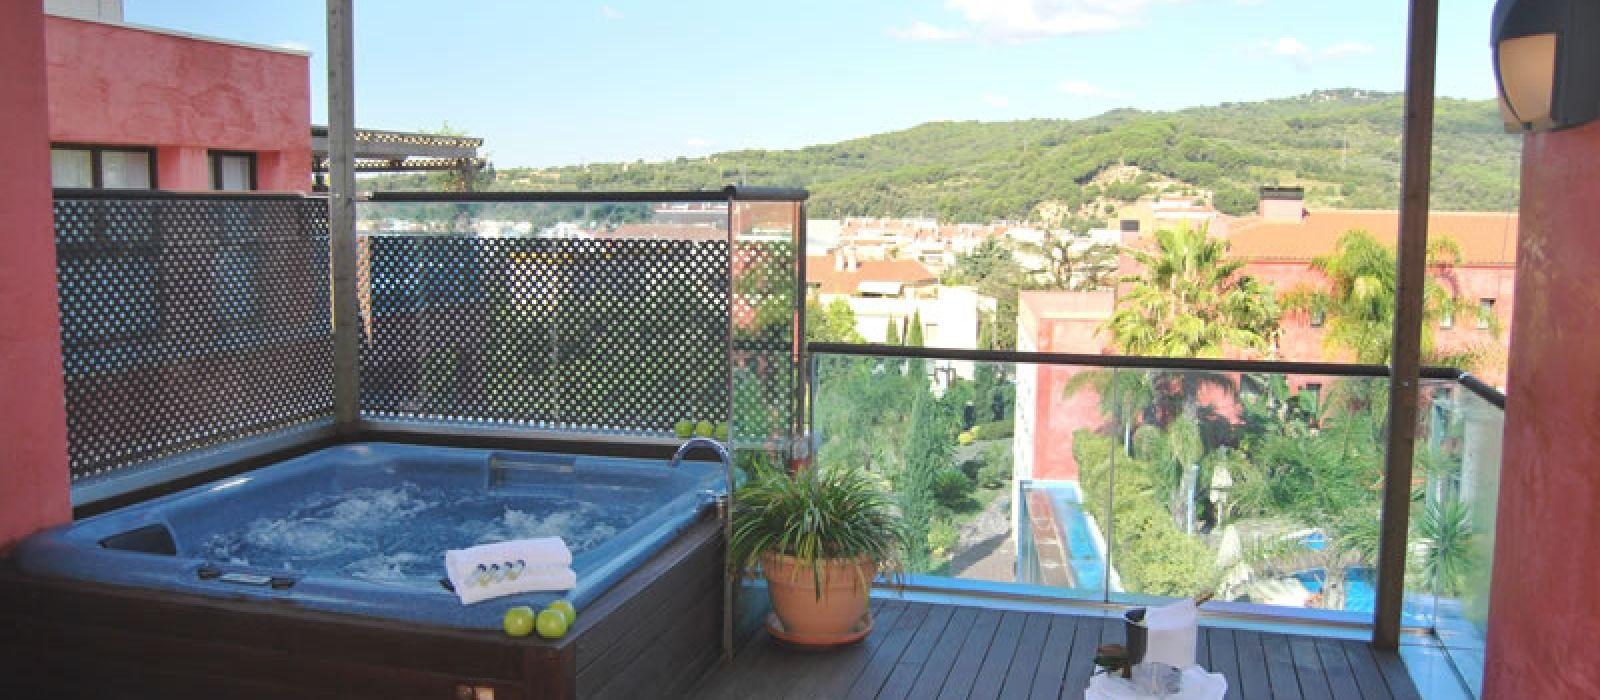 Suite con Jacuzzi | Hotel Blancafort